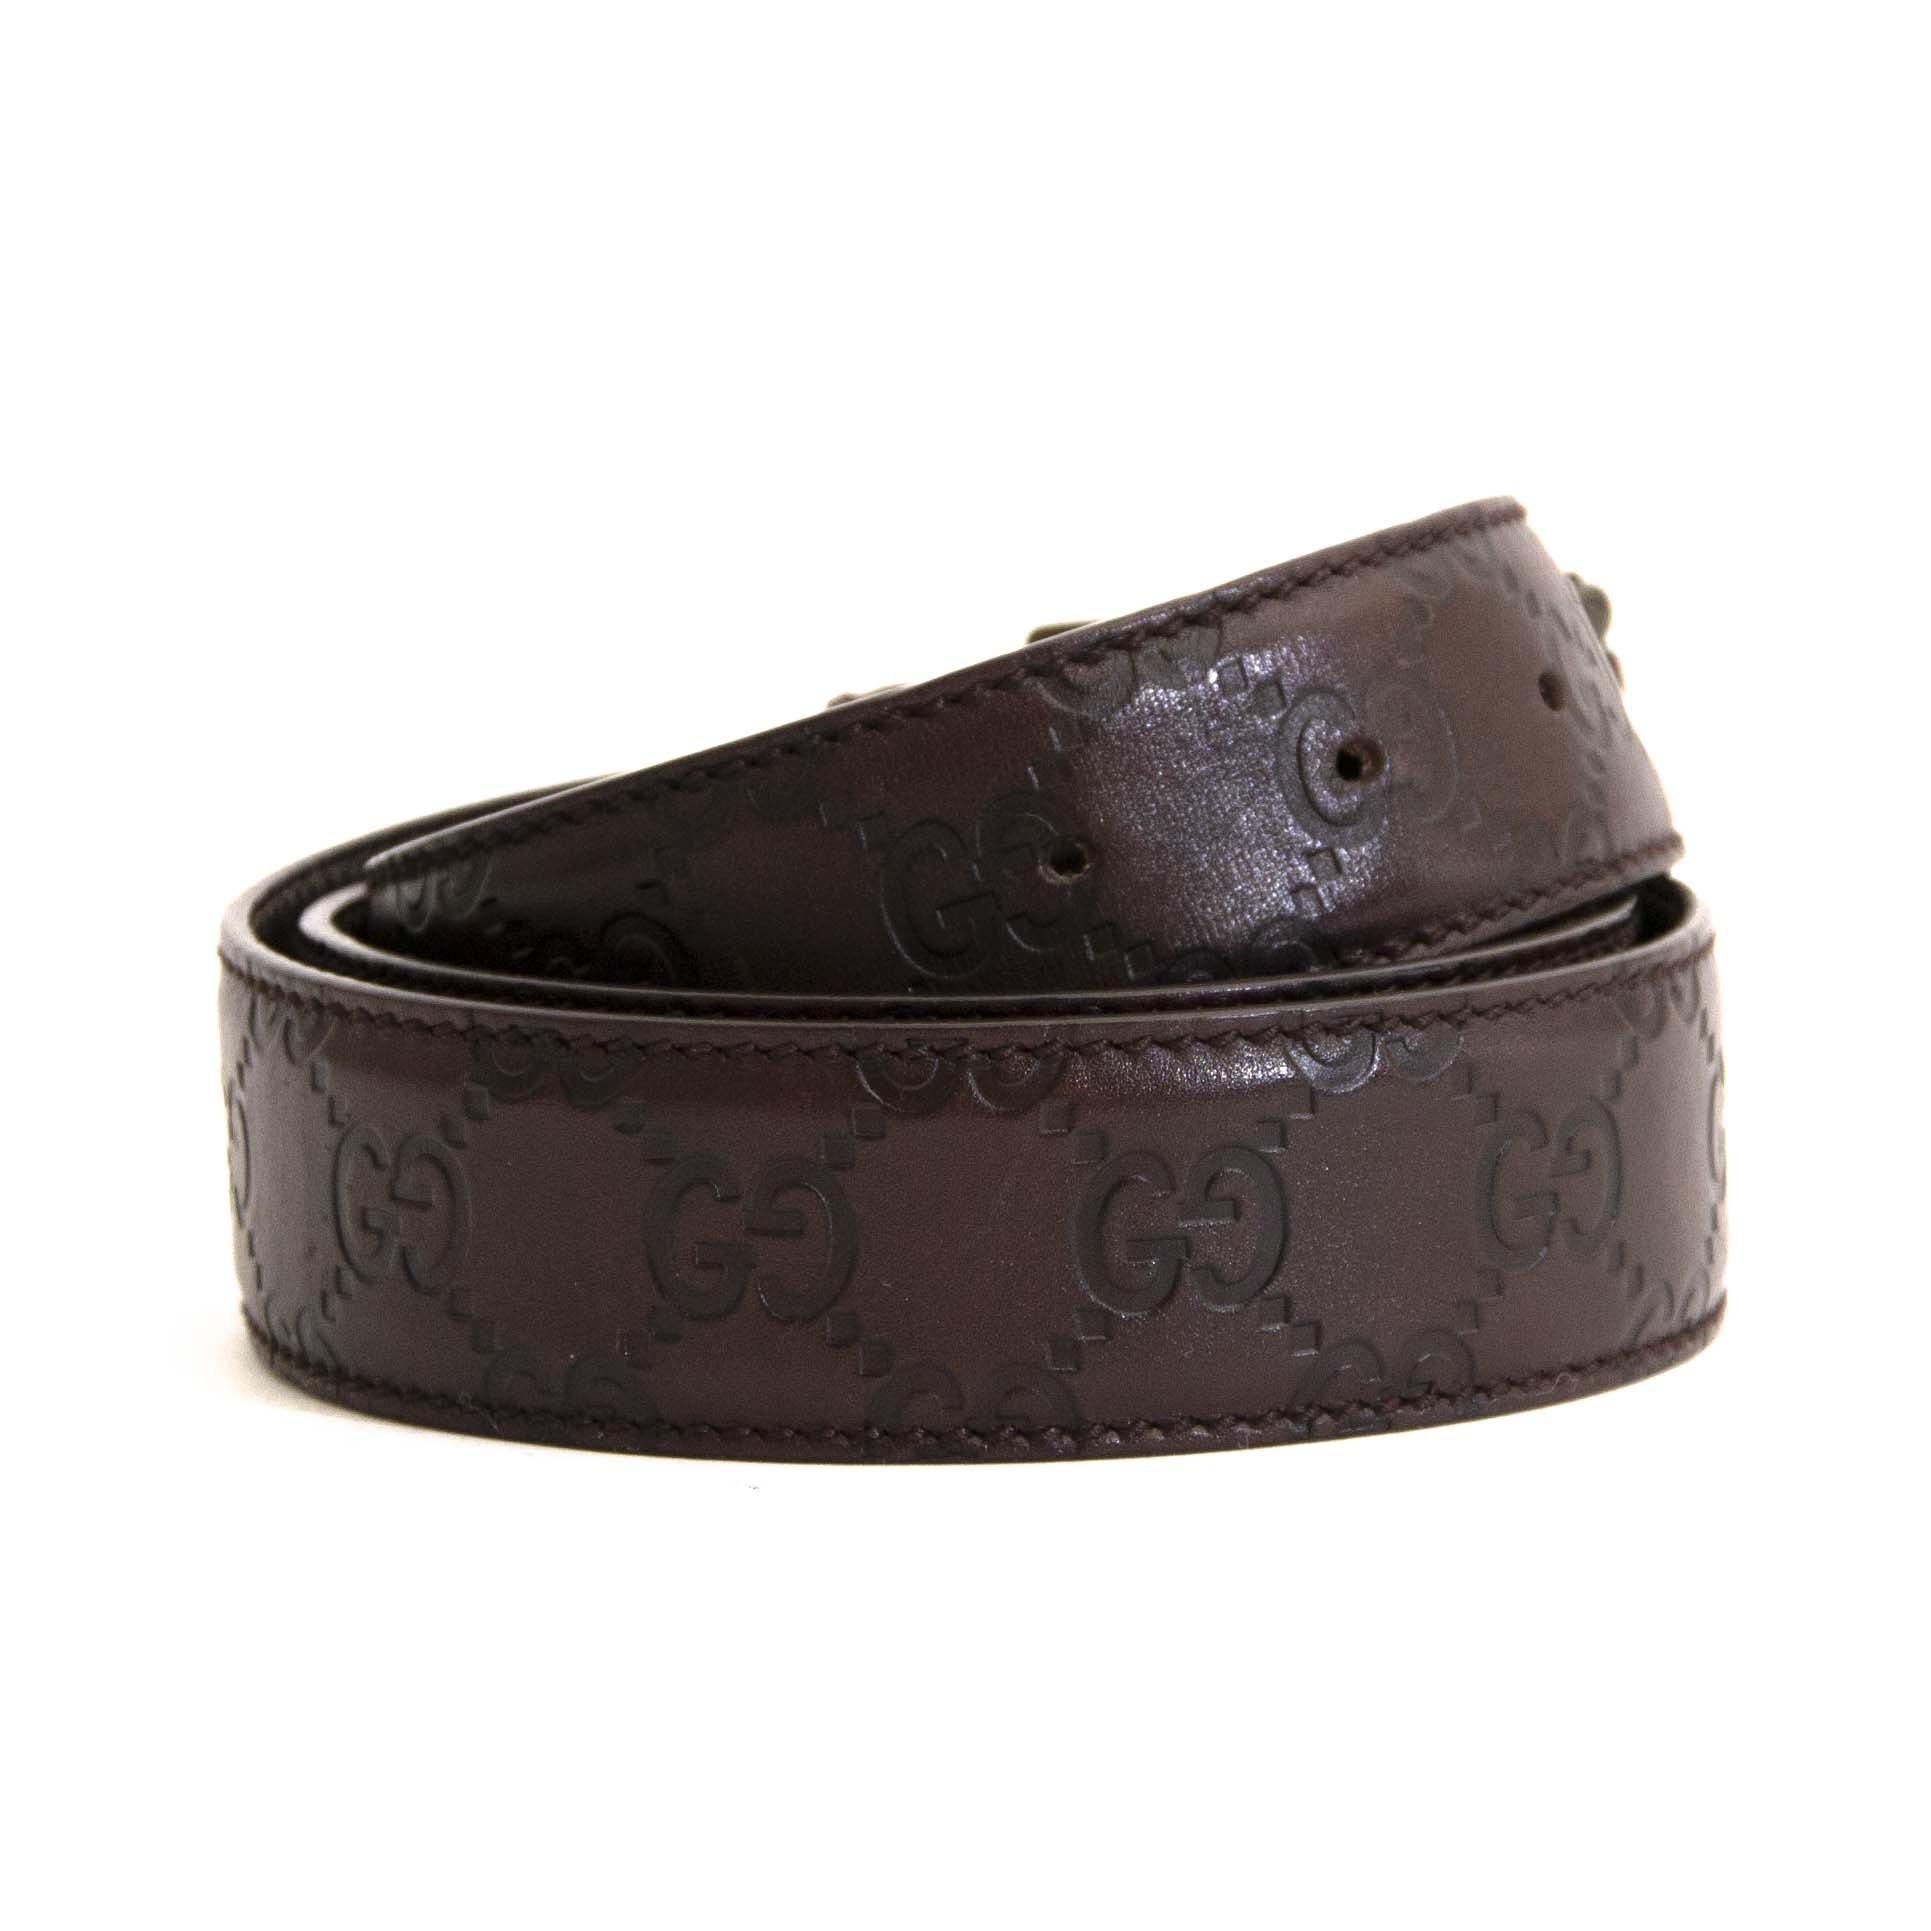 acheter en ligne seconde main Gucci Dark Brown Leather Logo Belt - Size 95